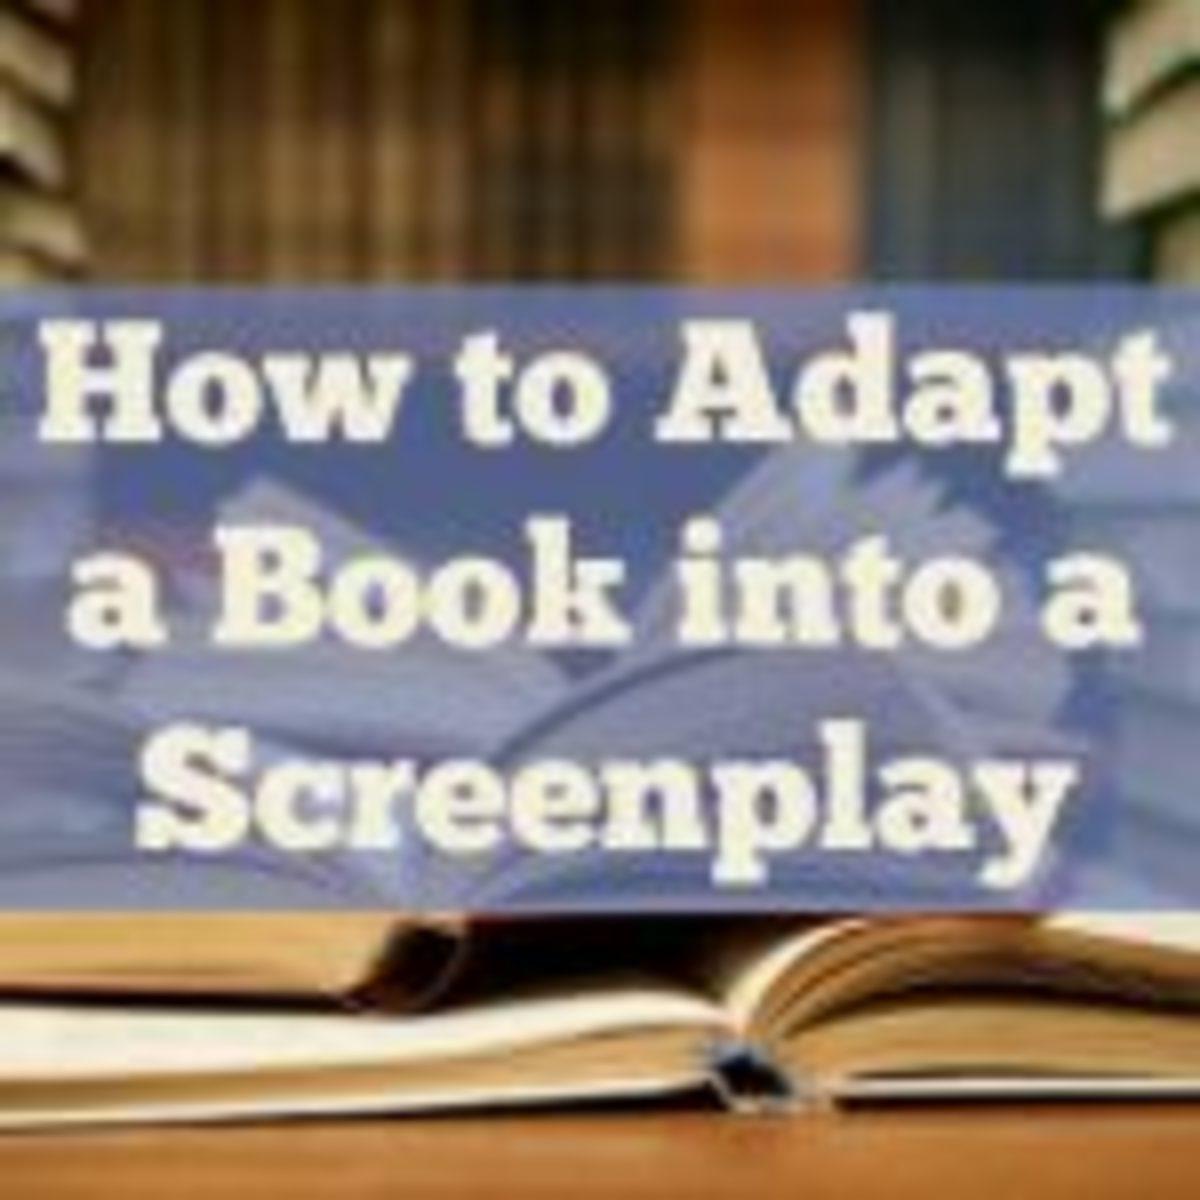 adapting-books-into-screenplays